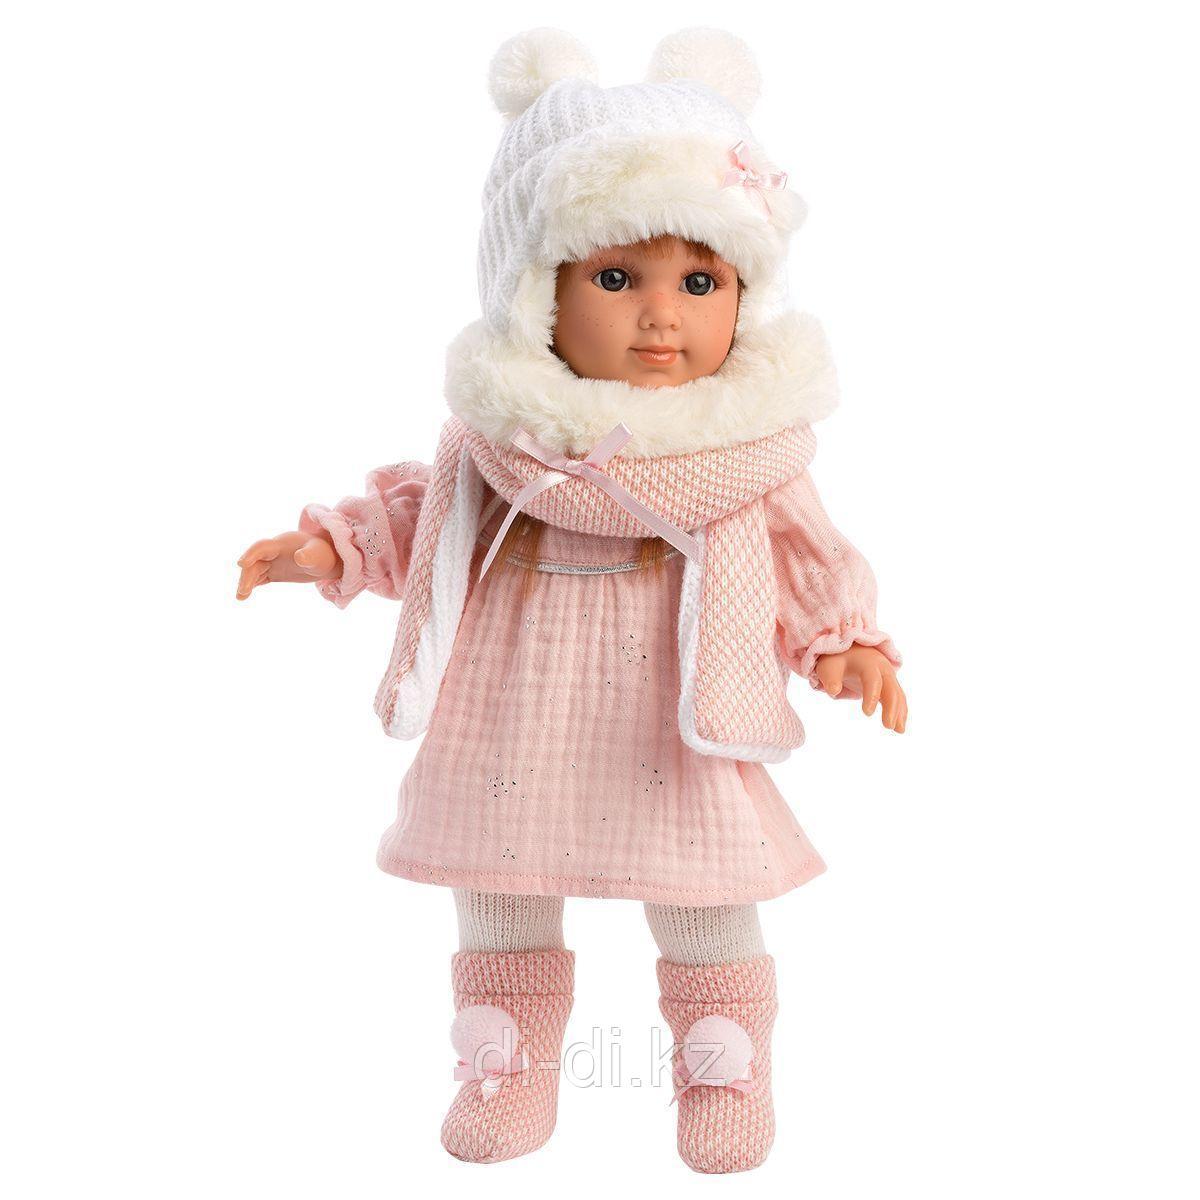 LLORENS Кукла Николь 35 см, шатенка в розовом костюме